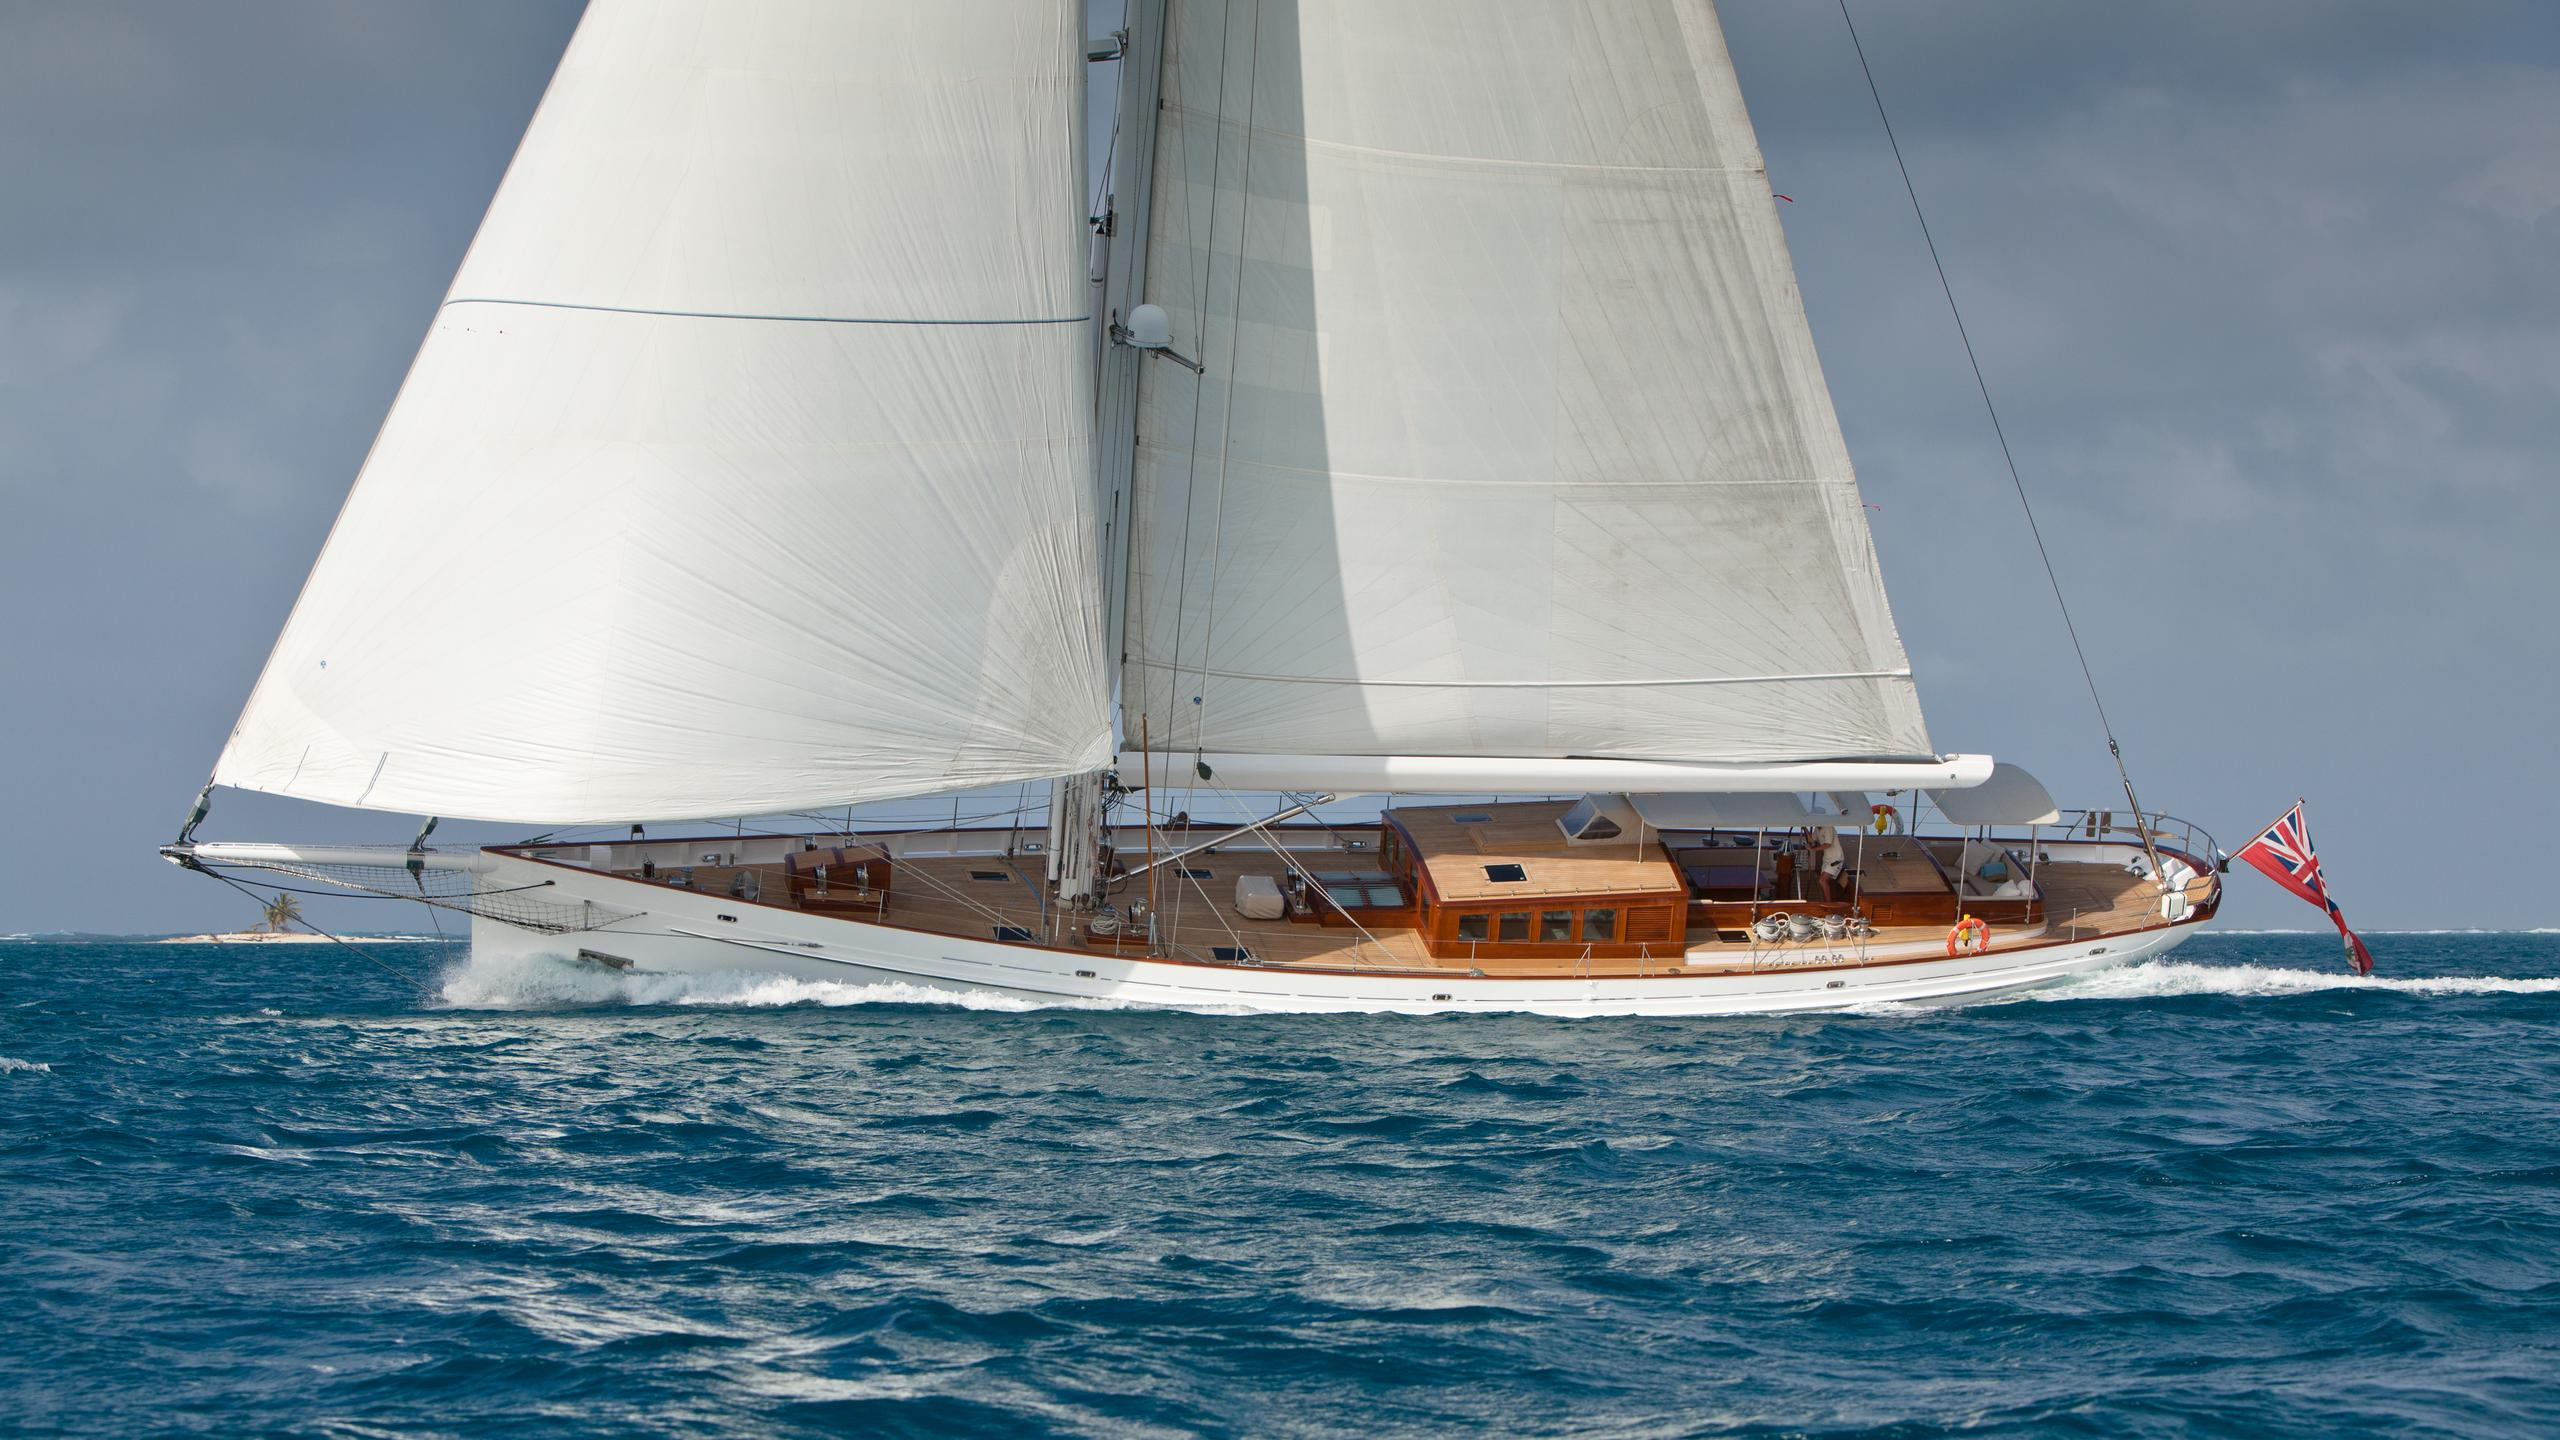 carl-linne-yacht-sailing